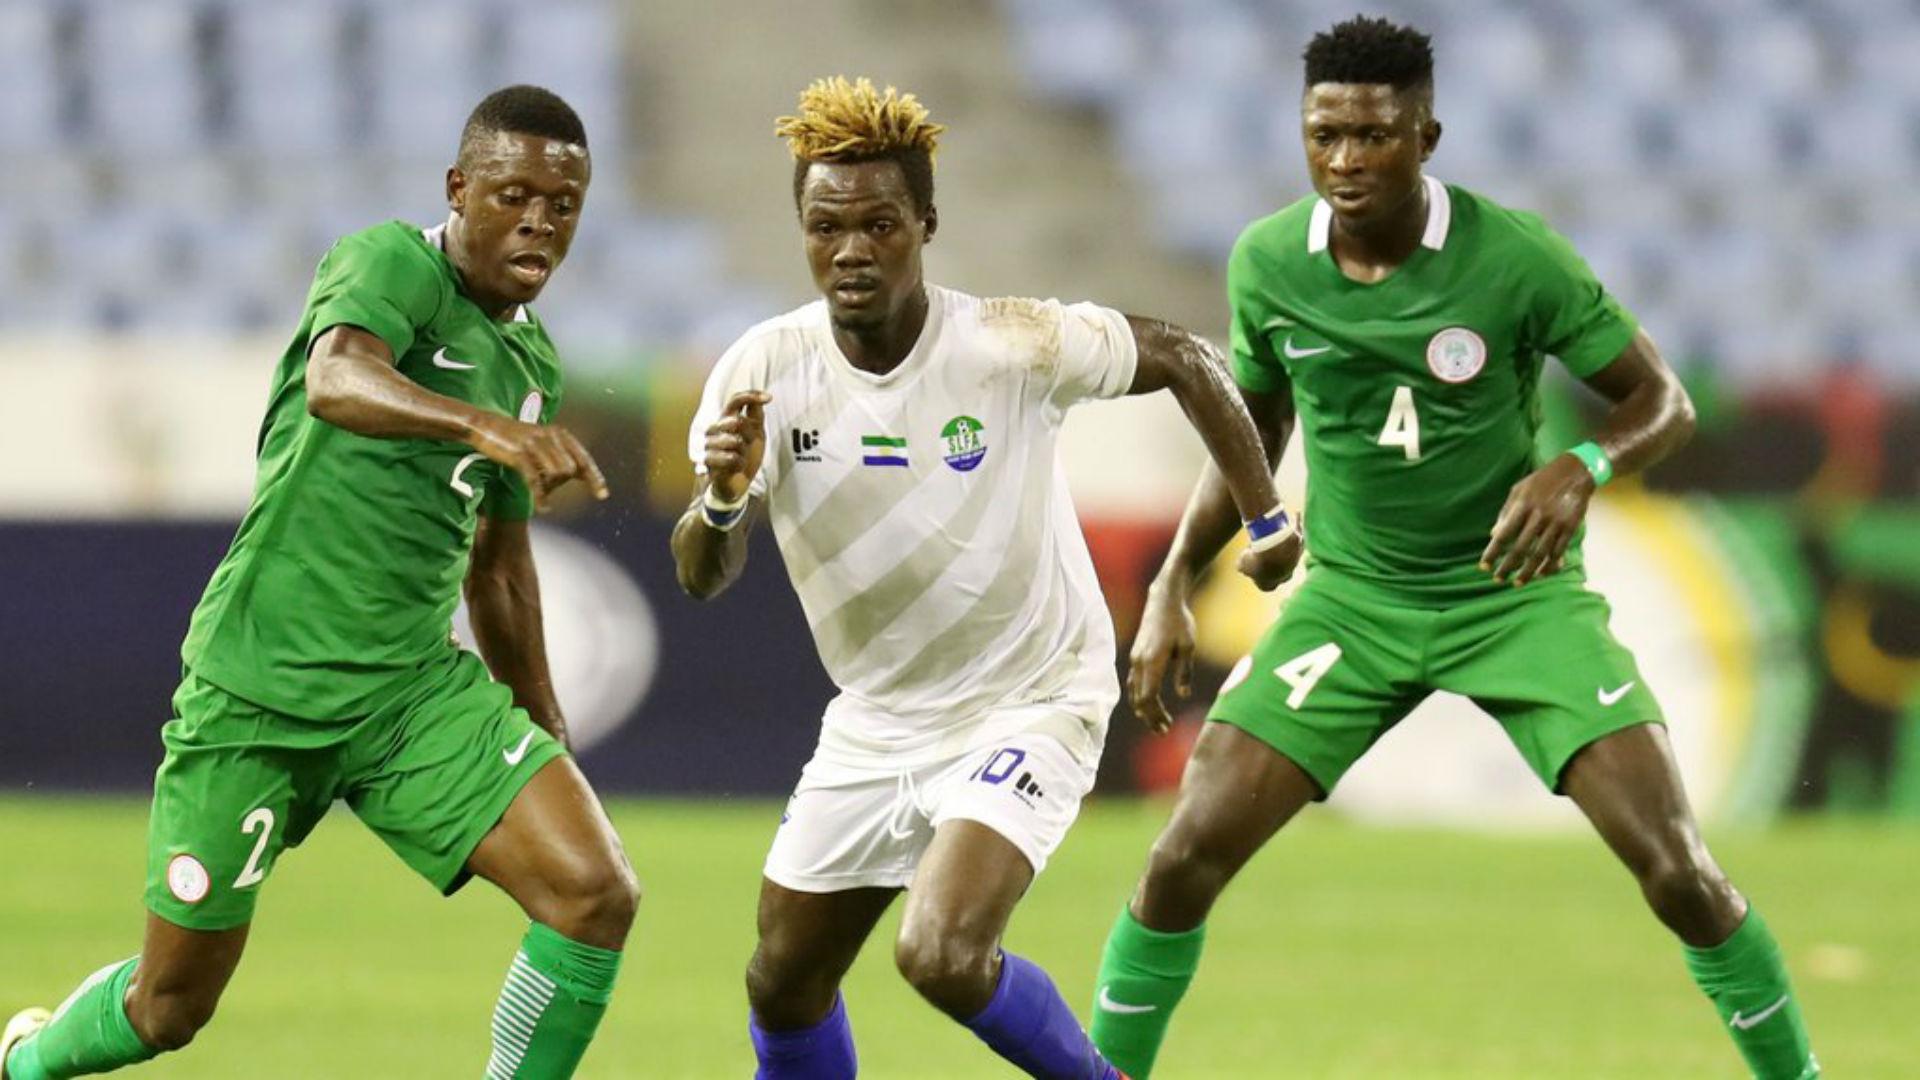 nigeria-versus-sierra-leone-sports-leo